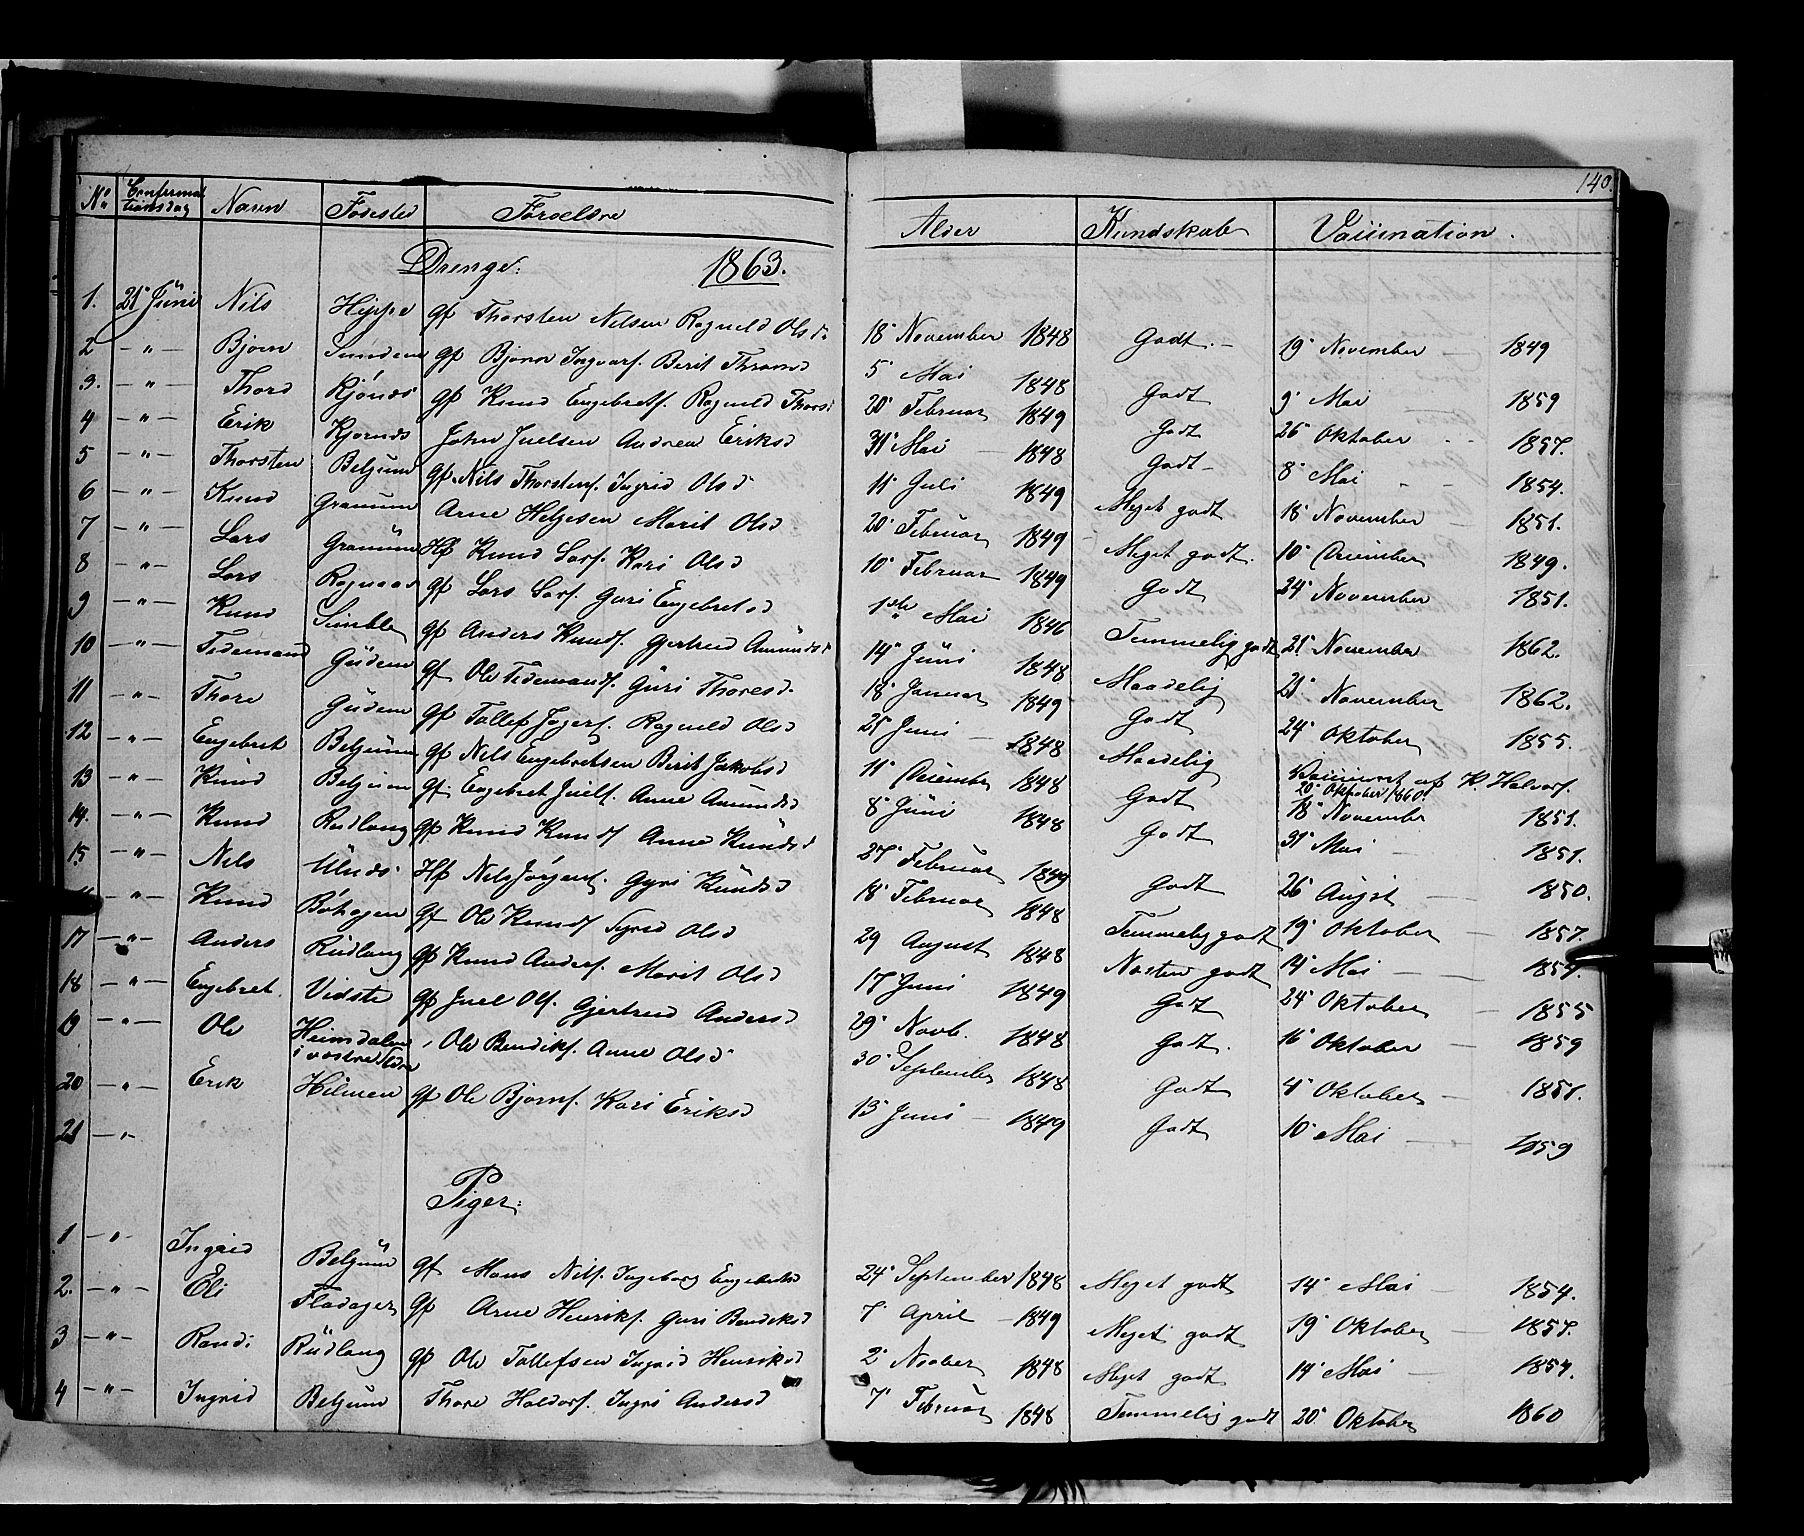 SAH, Nord-Aurdal prestekontor, Ministerialbok nr. 6, 1842-1863, s. 140